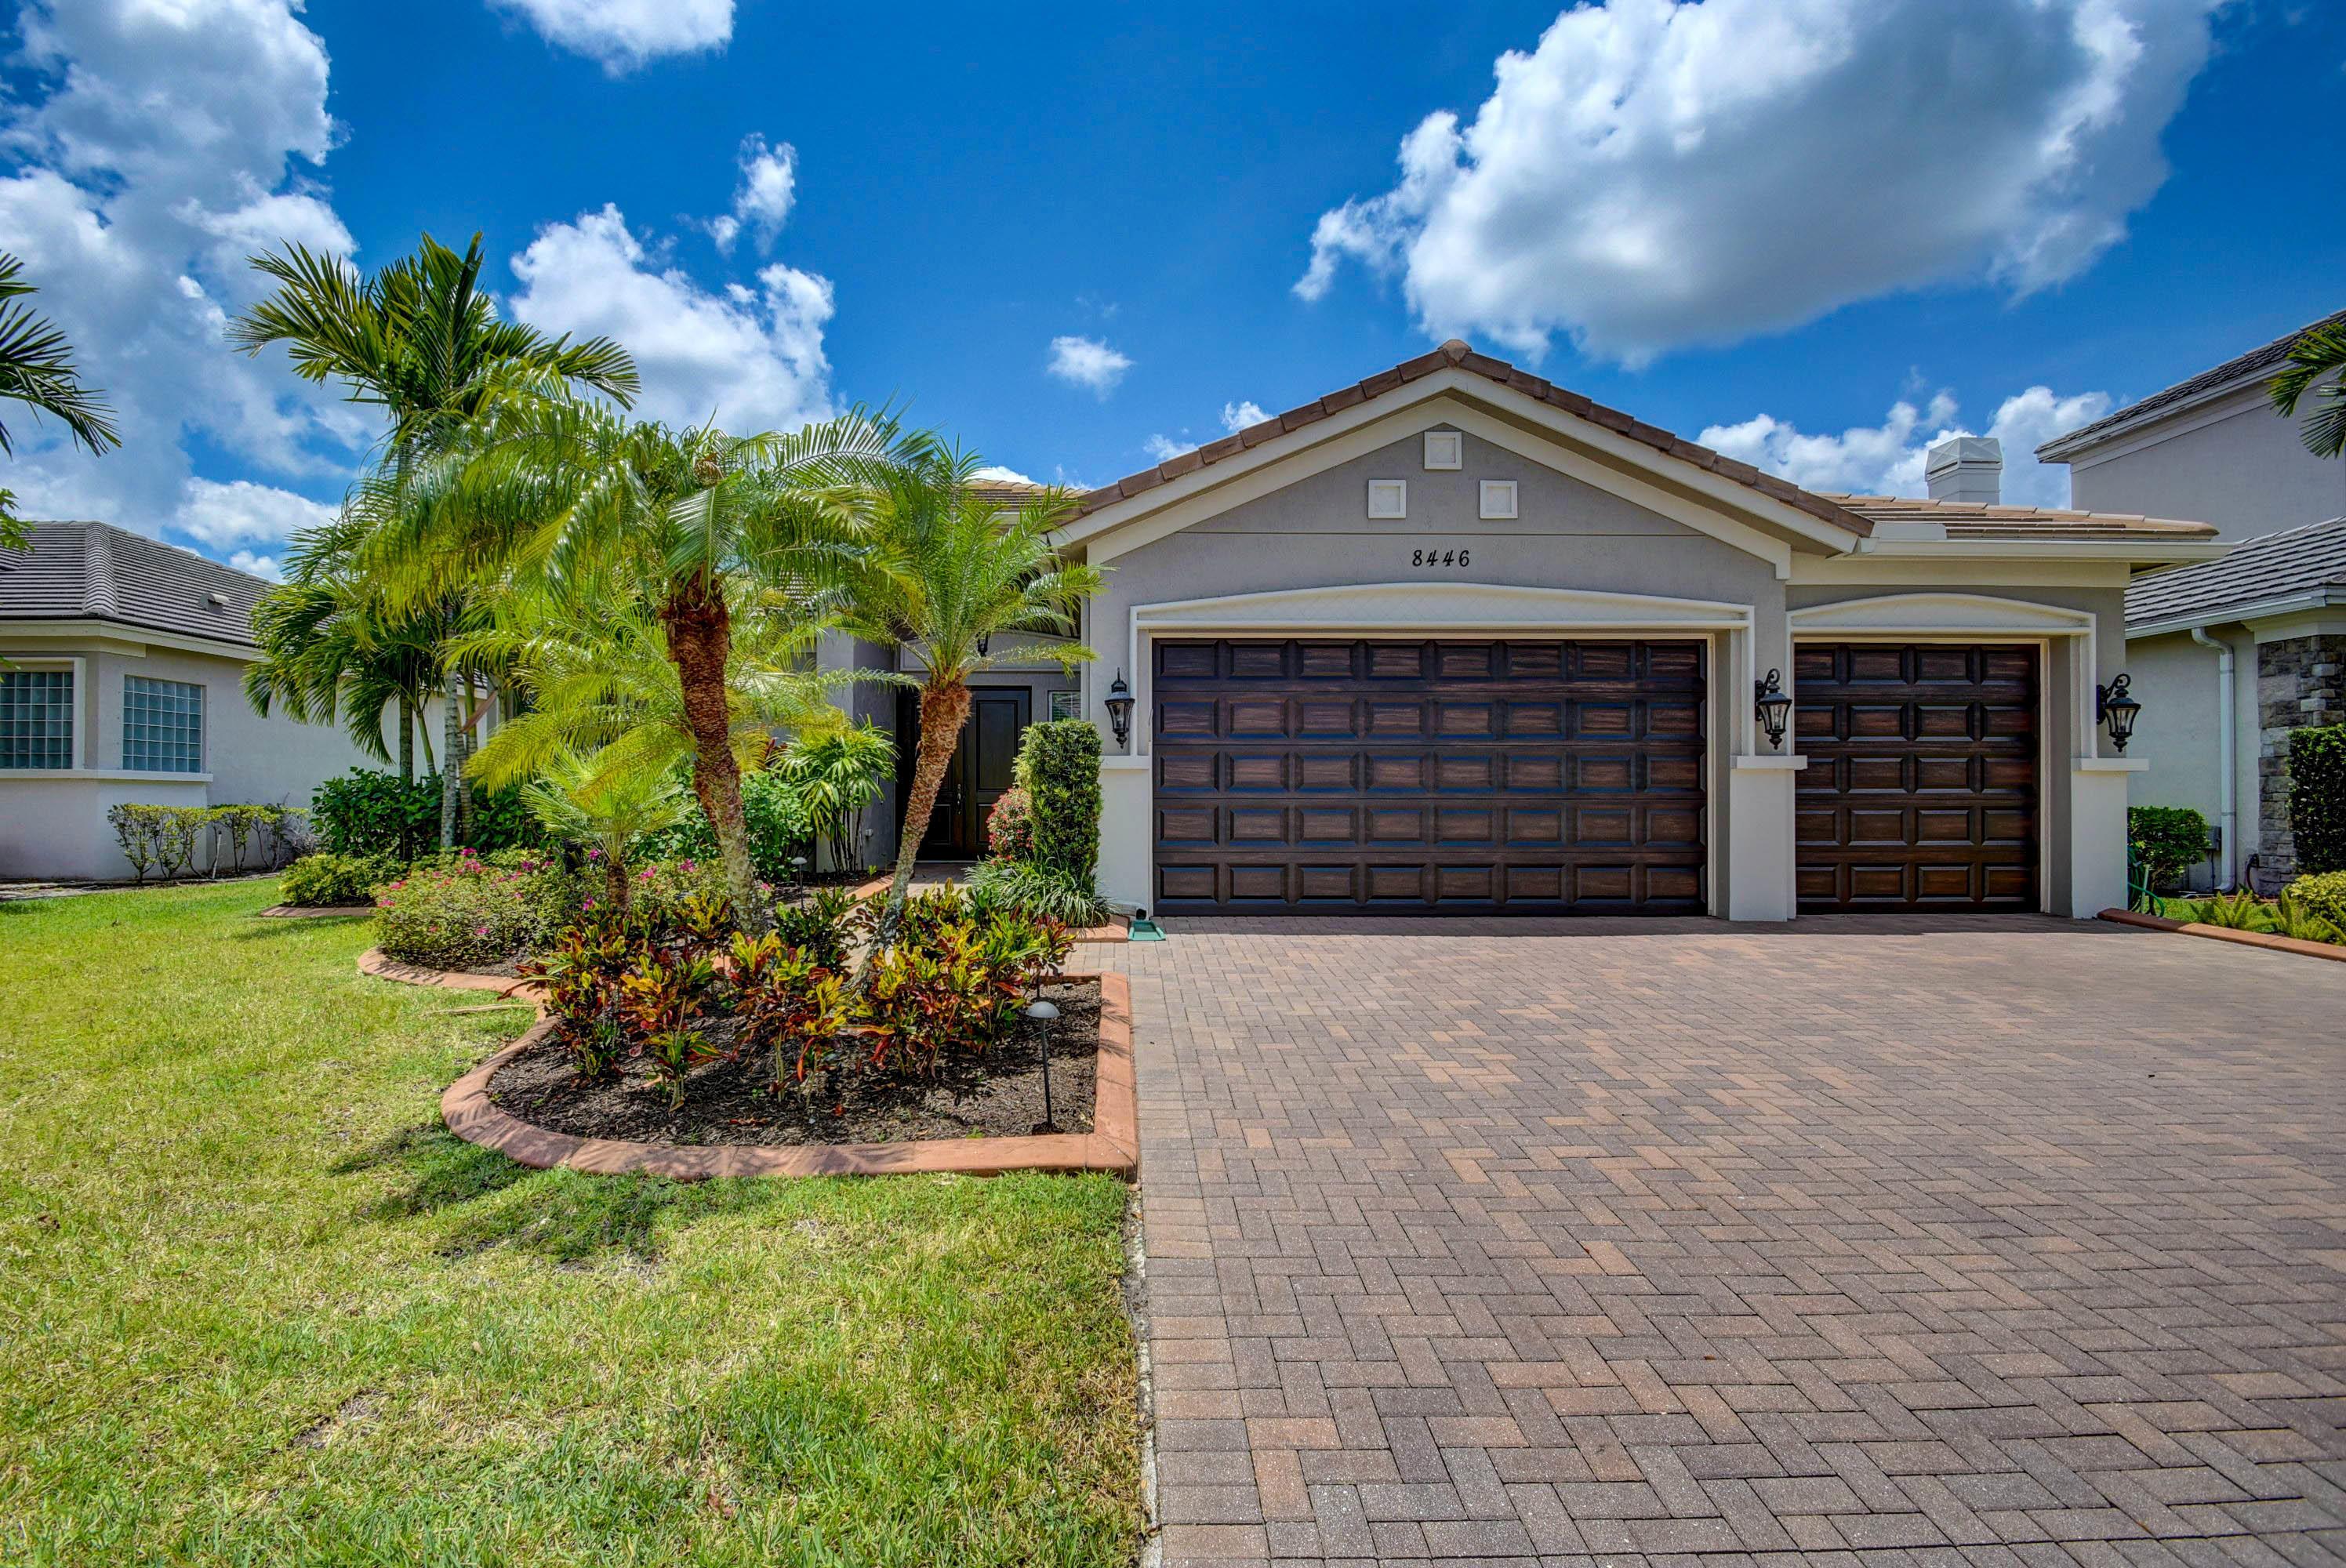 Photo of 8446 Butler Greenwood Drive, Royal Palm Beach, FL 33411